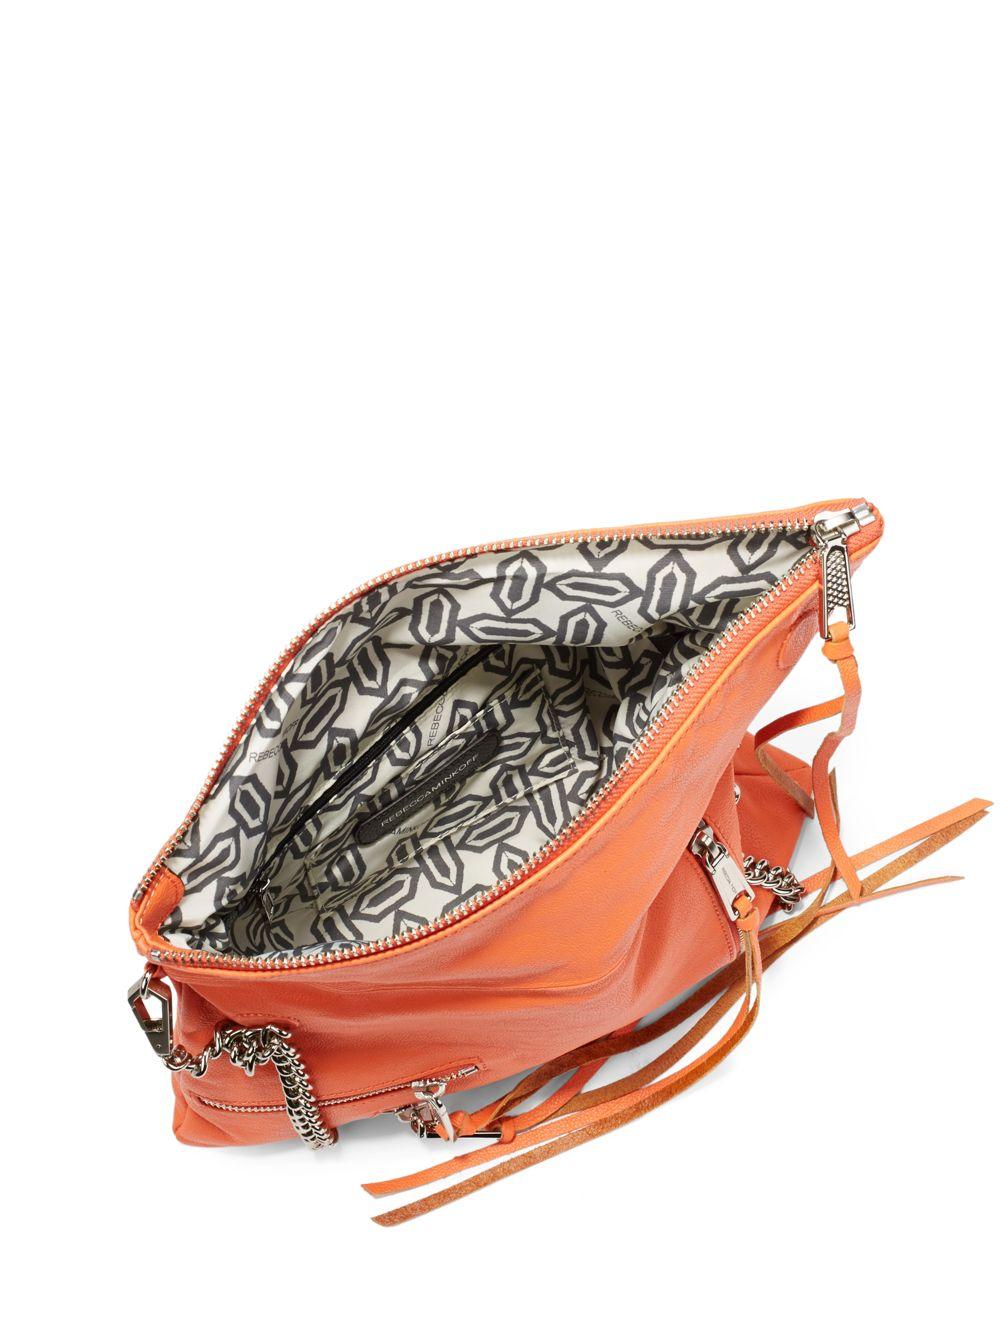 817571e446 Lyst - Rebecca Minkoff Harper Studded Crossbody Bag in Orange